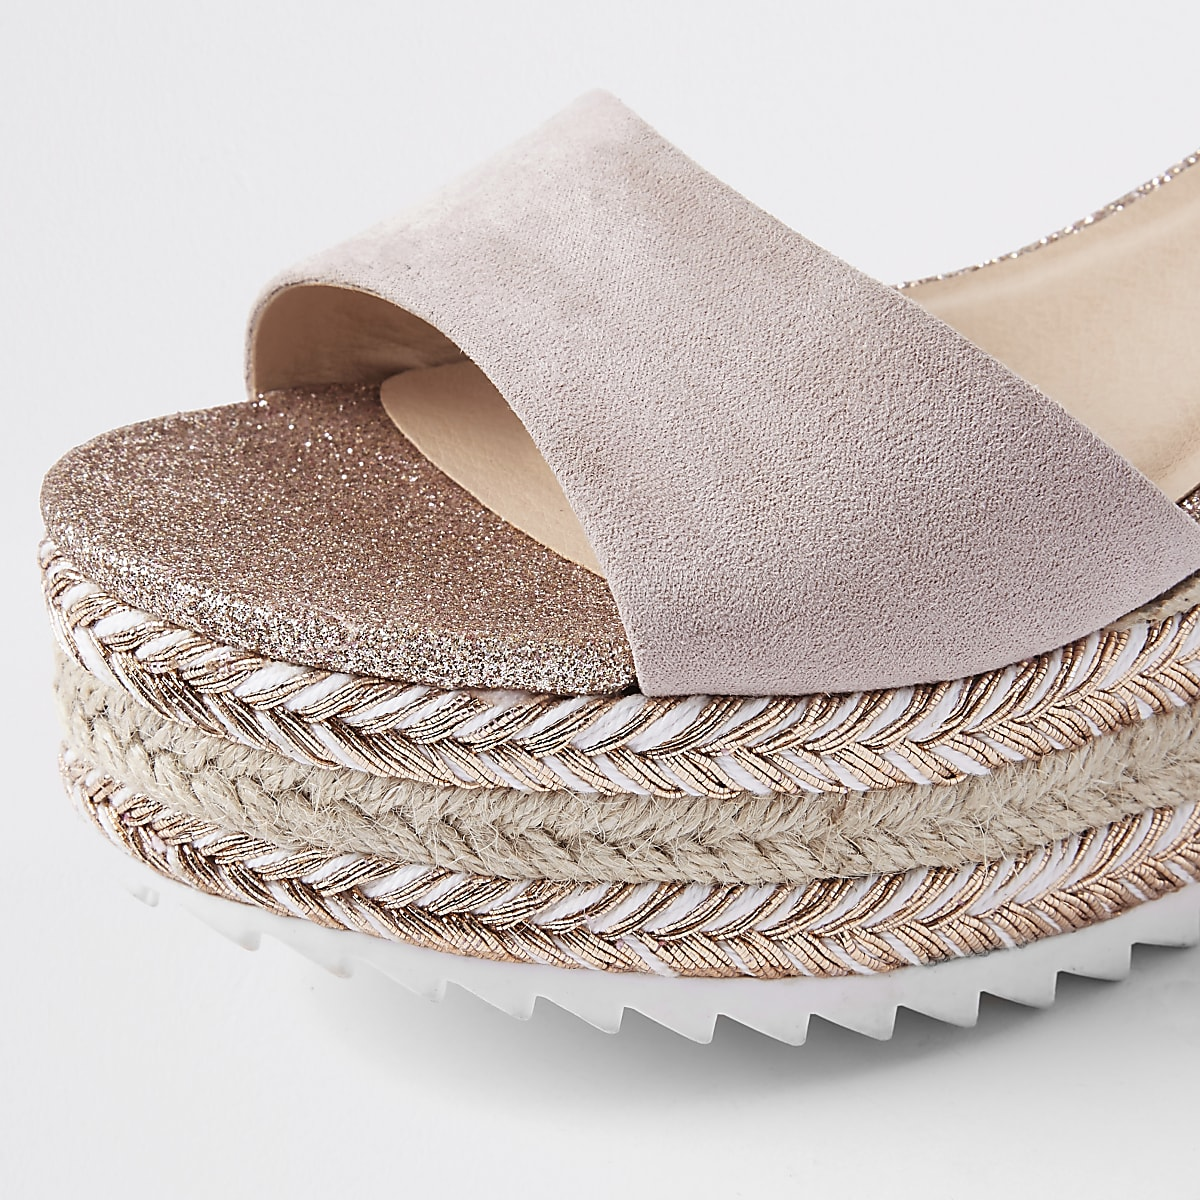 d5a3b733f016 Gold glitter espadrille platform sandals - Sandals - Shoes   Boots ...